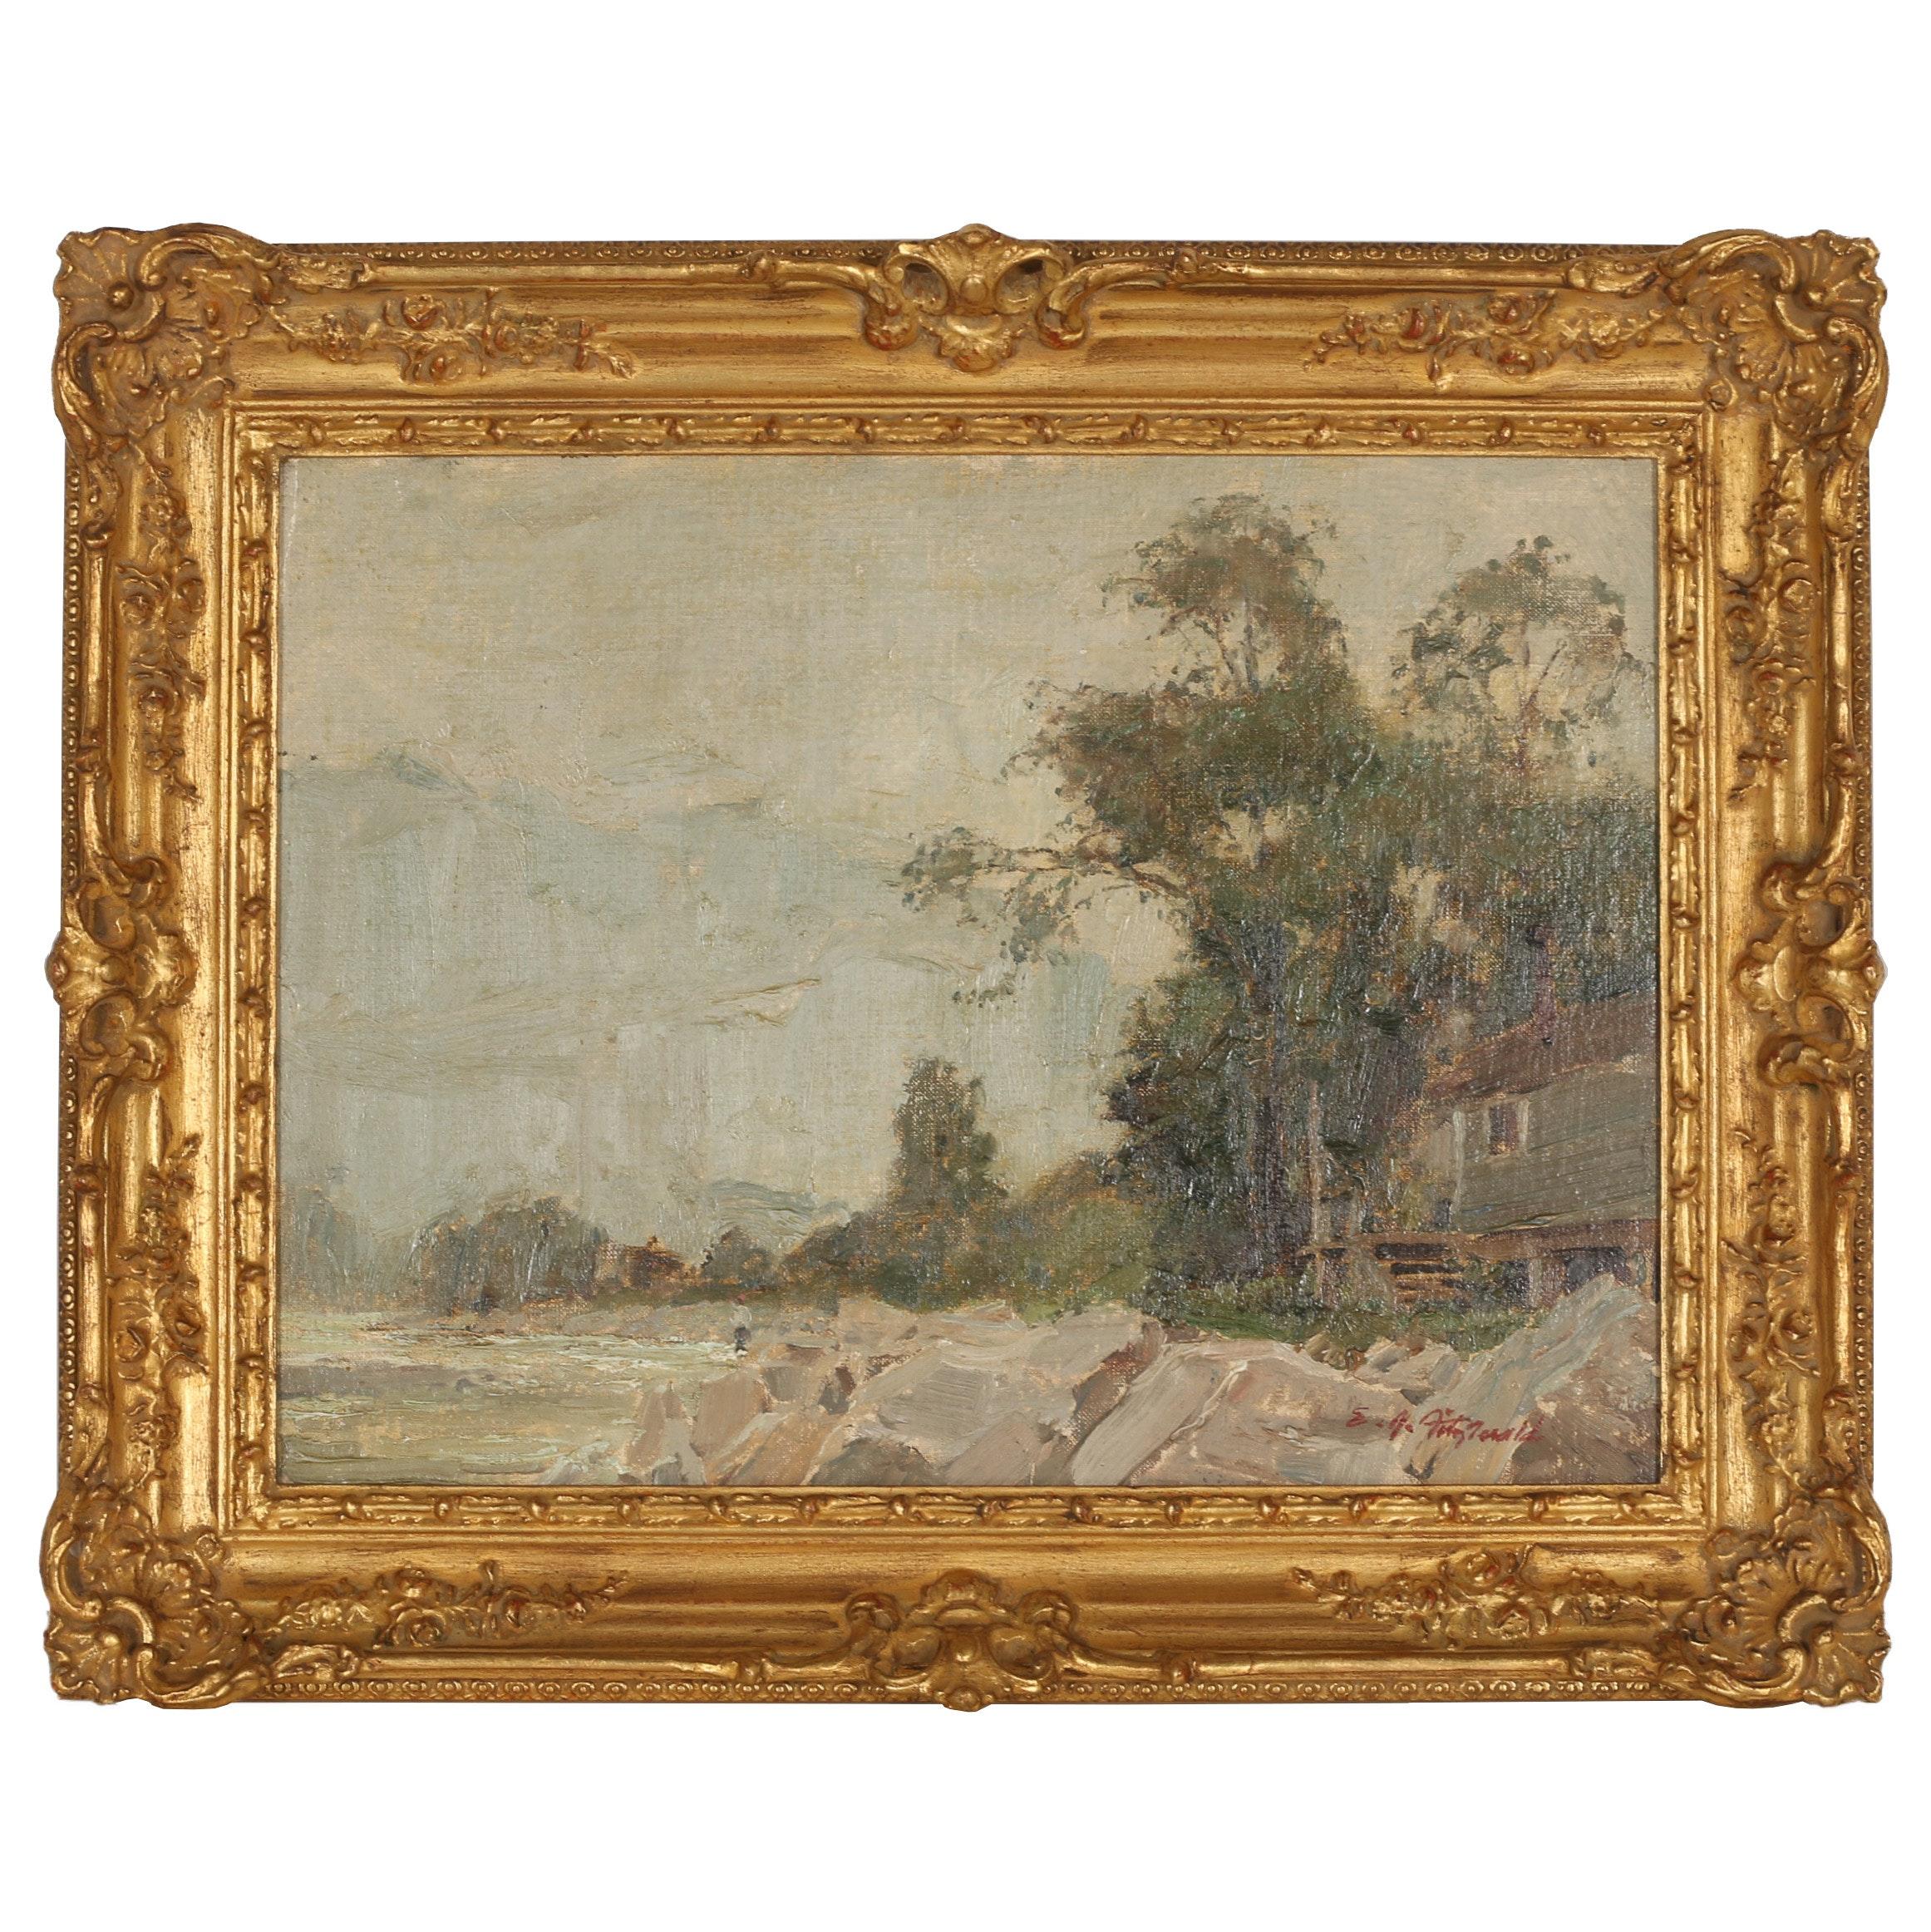 Edmond J. Fitzgerald Oil Painting of Shoreline